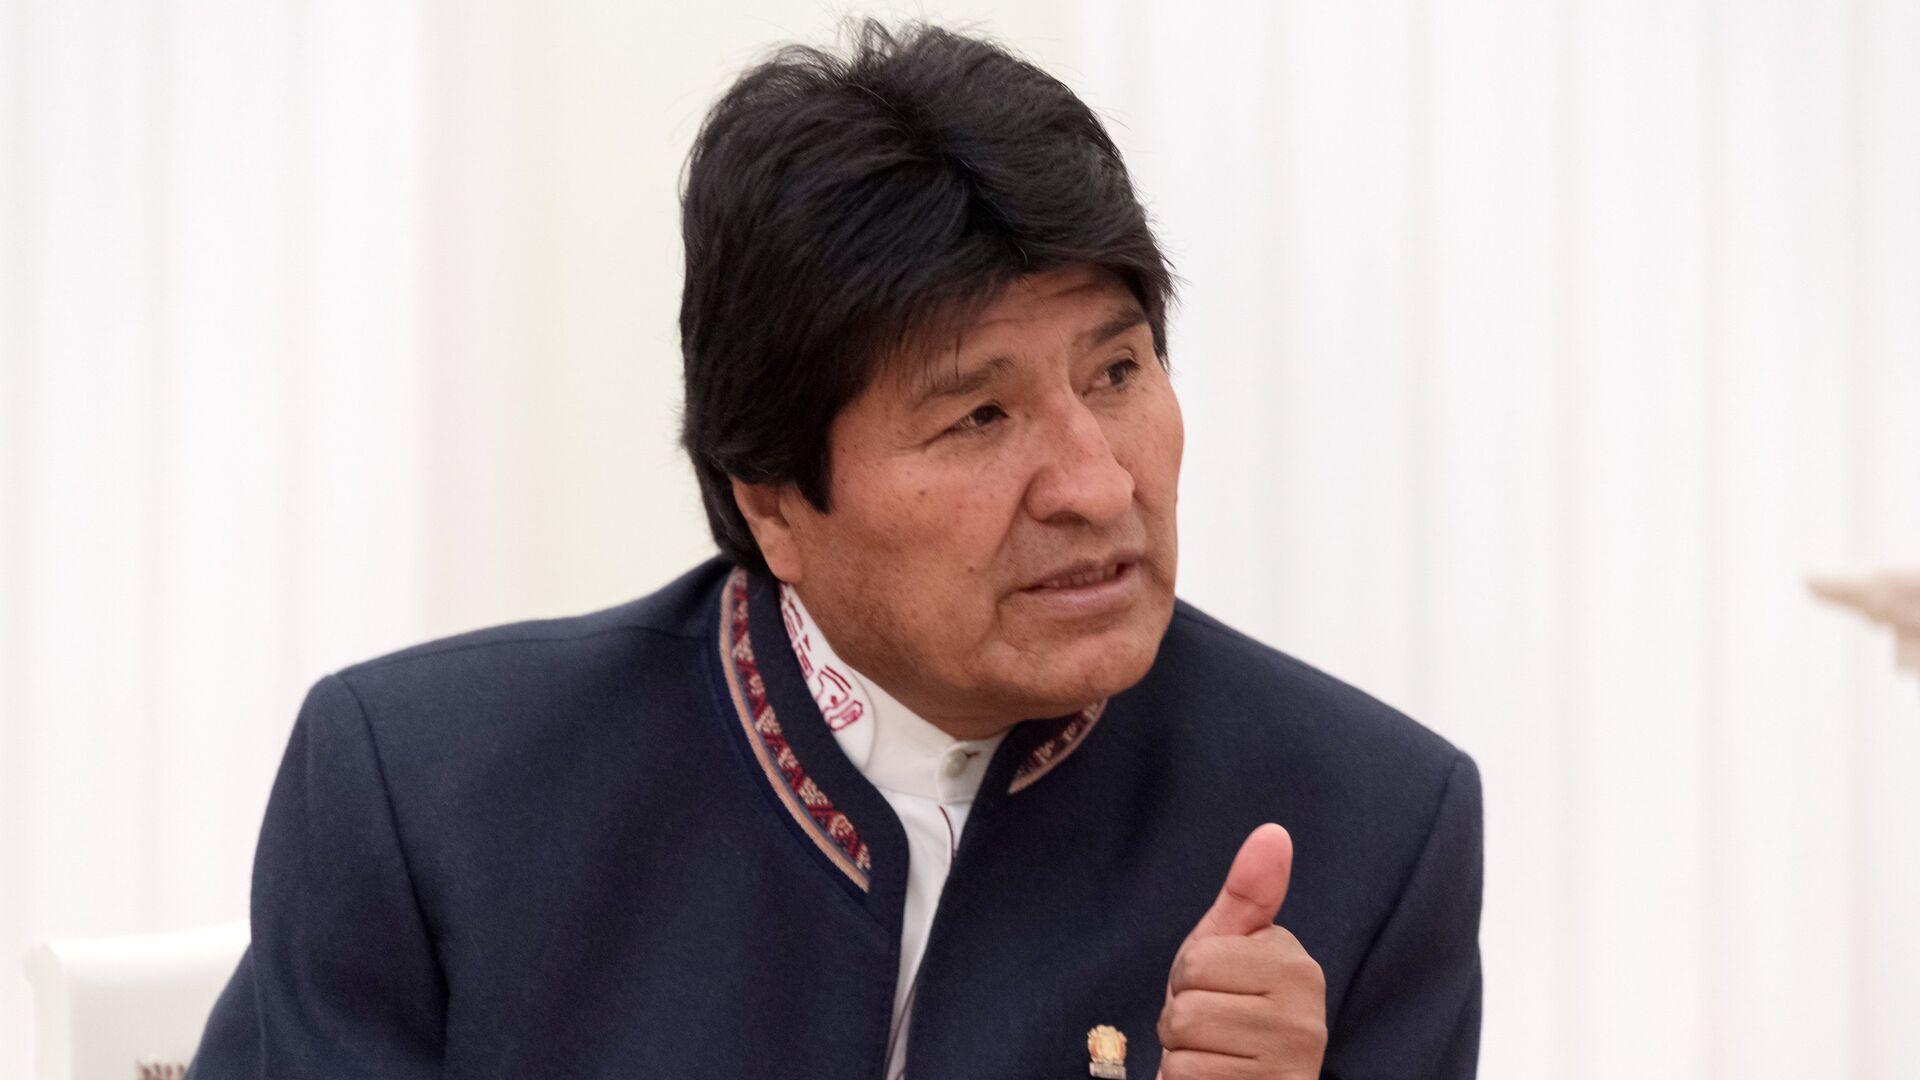 Президент Боливии Эво Моралес - РИА Новости, 1920, 29.02.2020